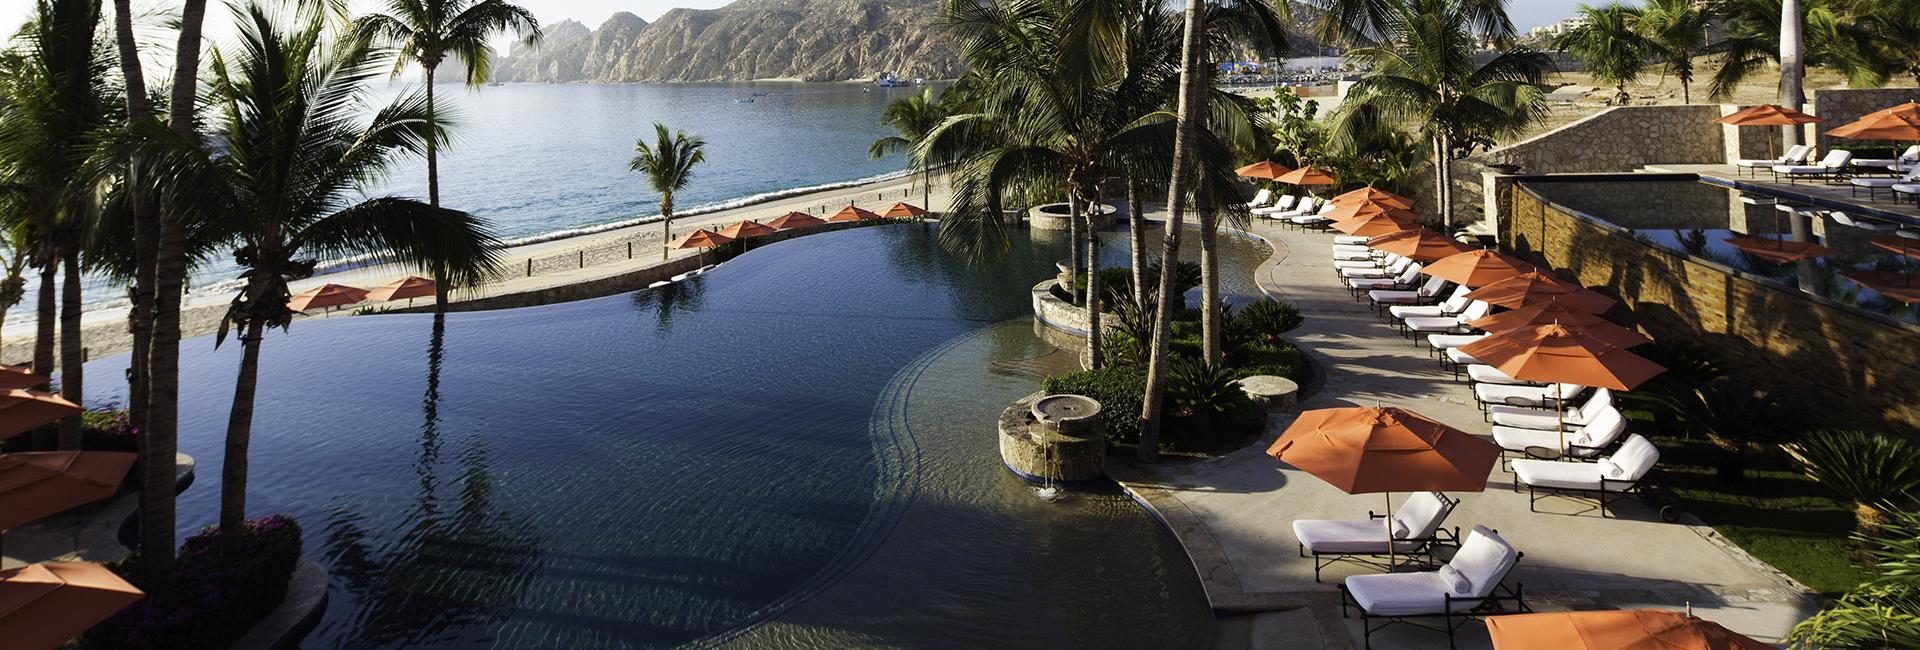 Hacienda Beach Club & Residences Cabo San Lucas